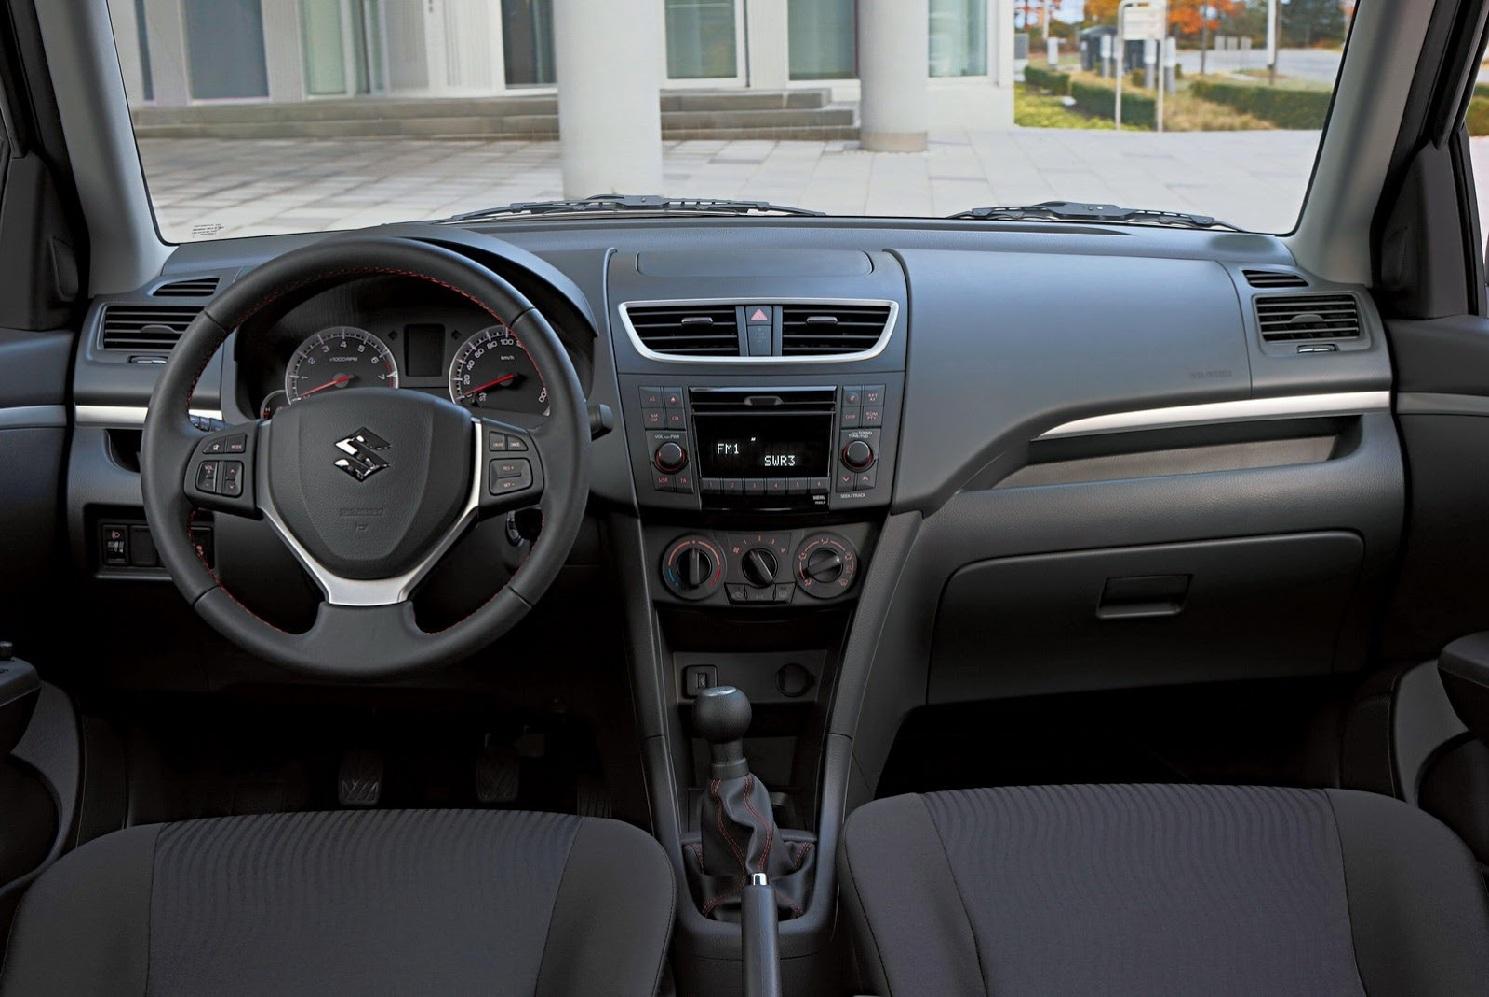 Suzuki Swift Setup Suzuki-swift-x-tra-1